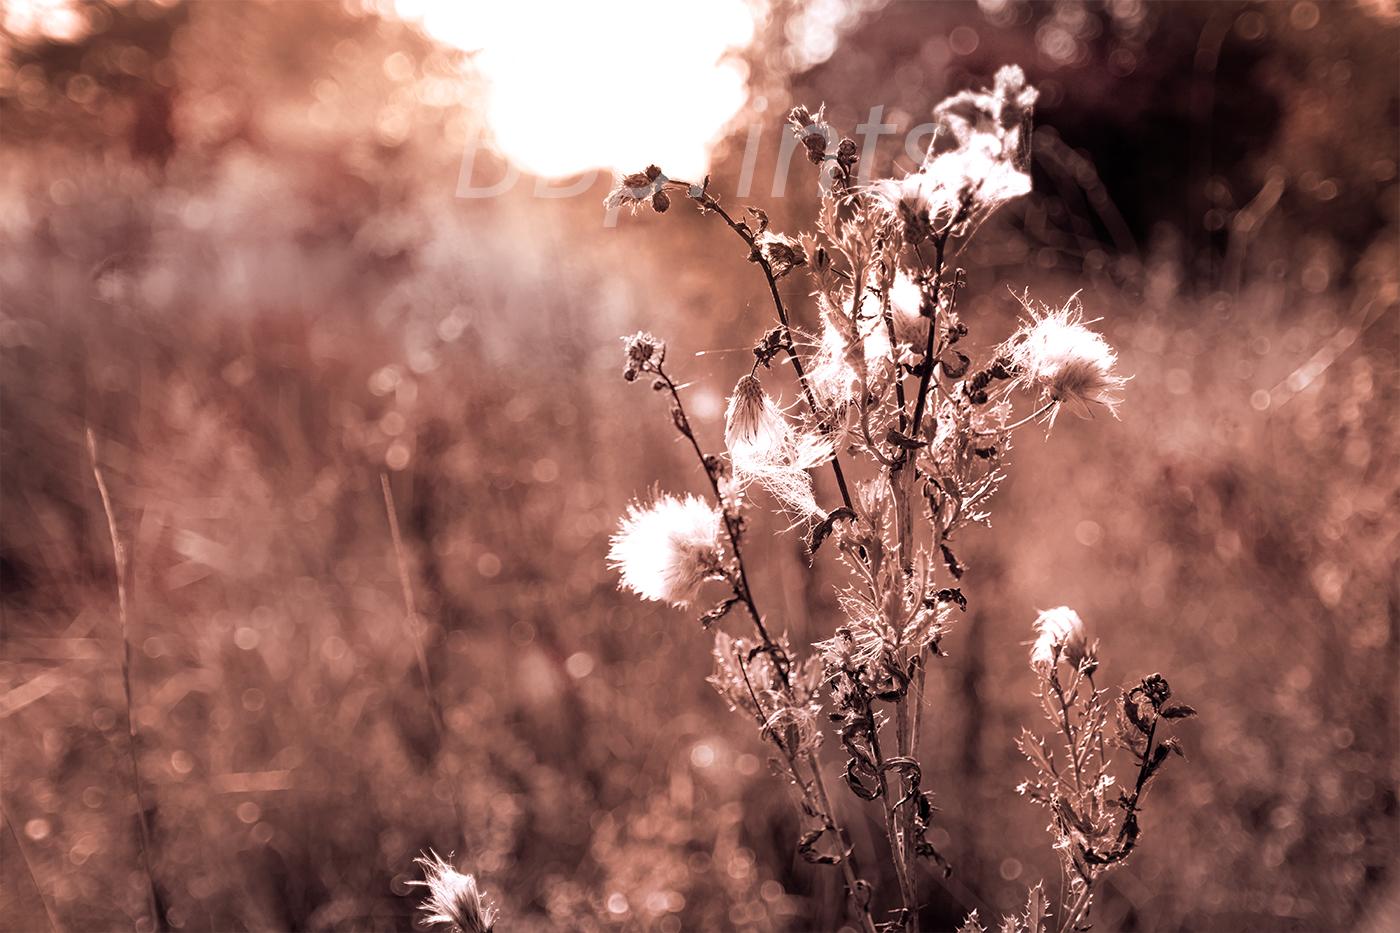 Nature photo, landscape photo, floral photo, flora photo example image 1